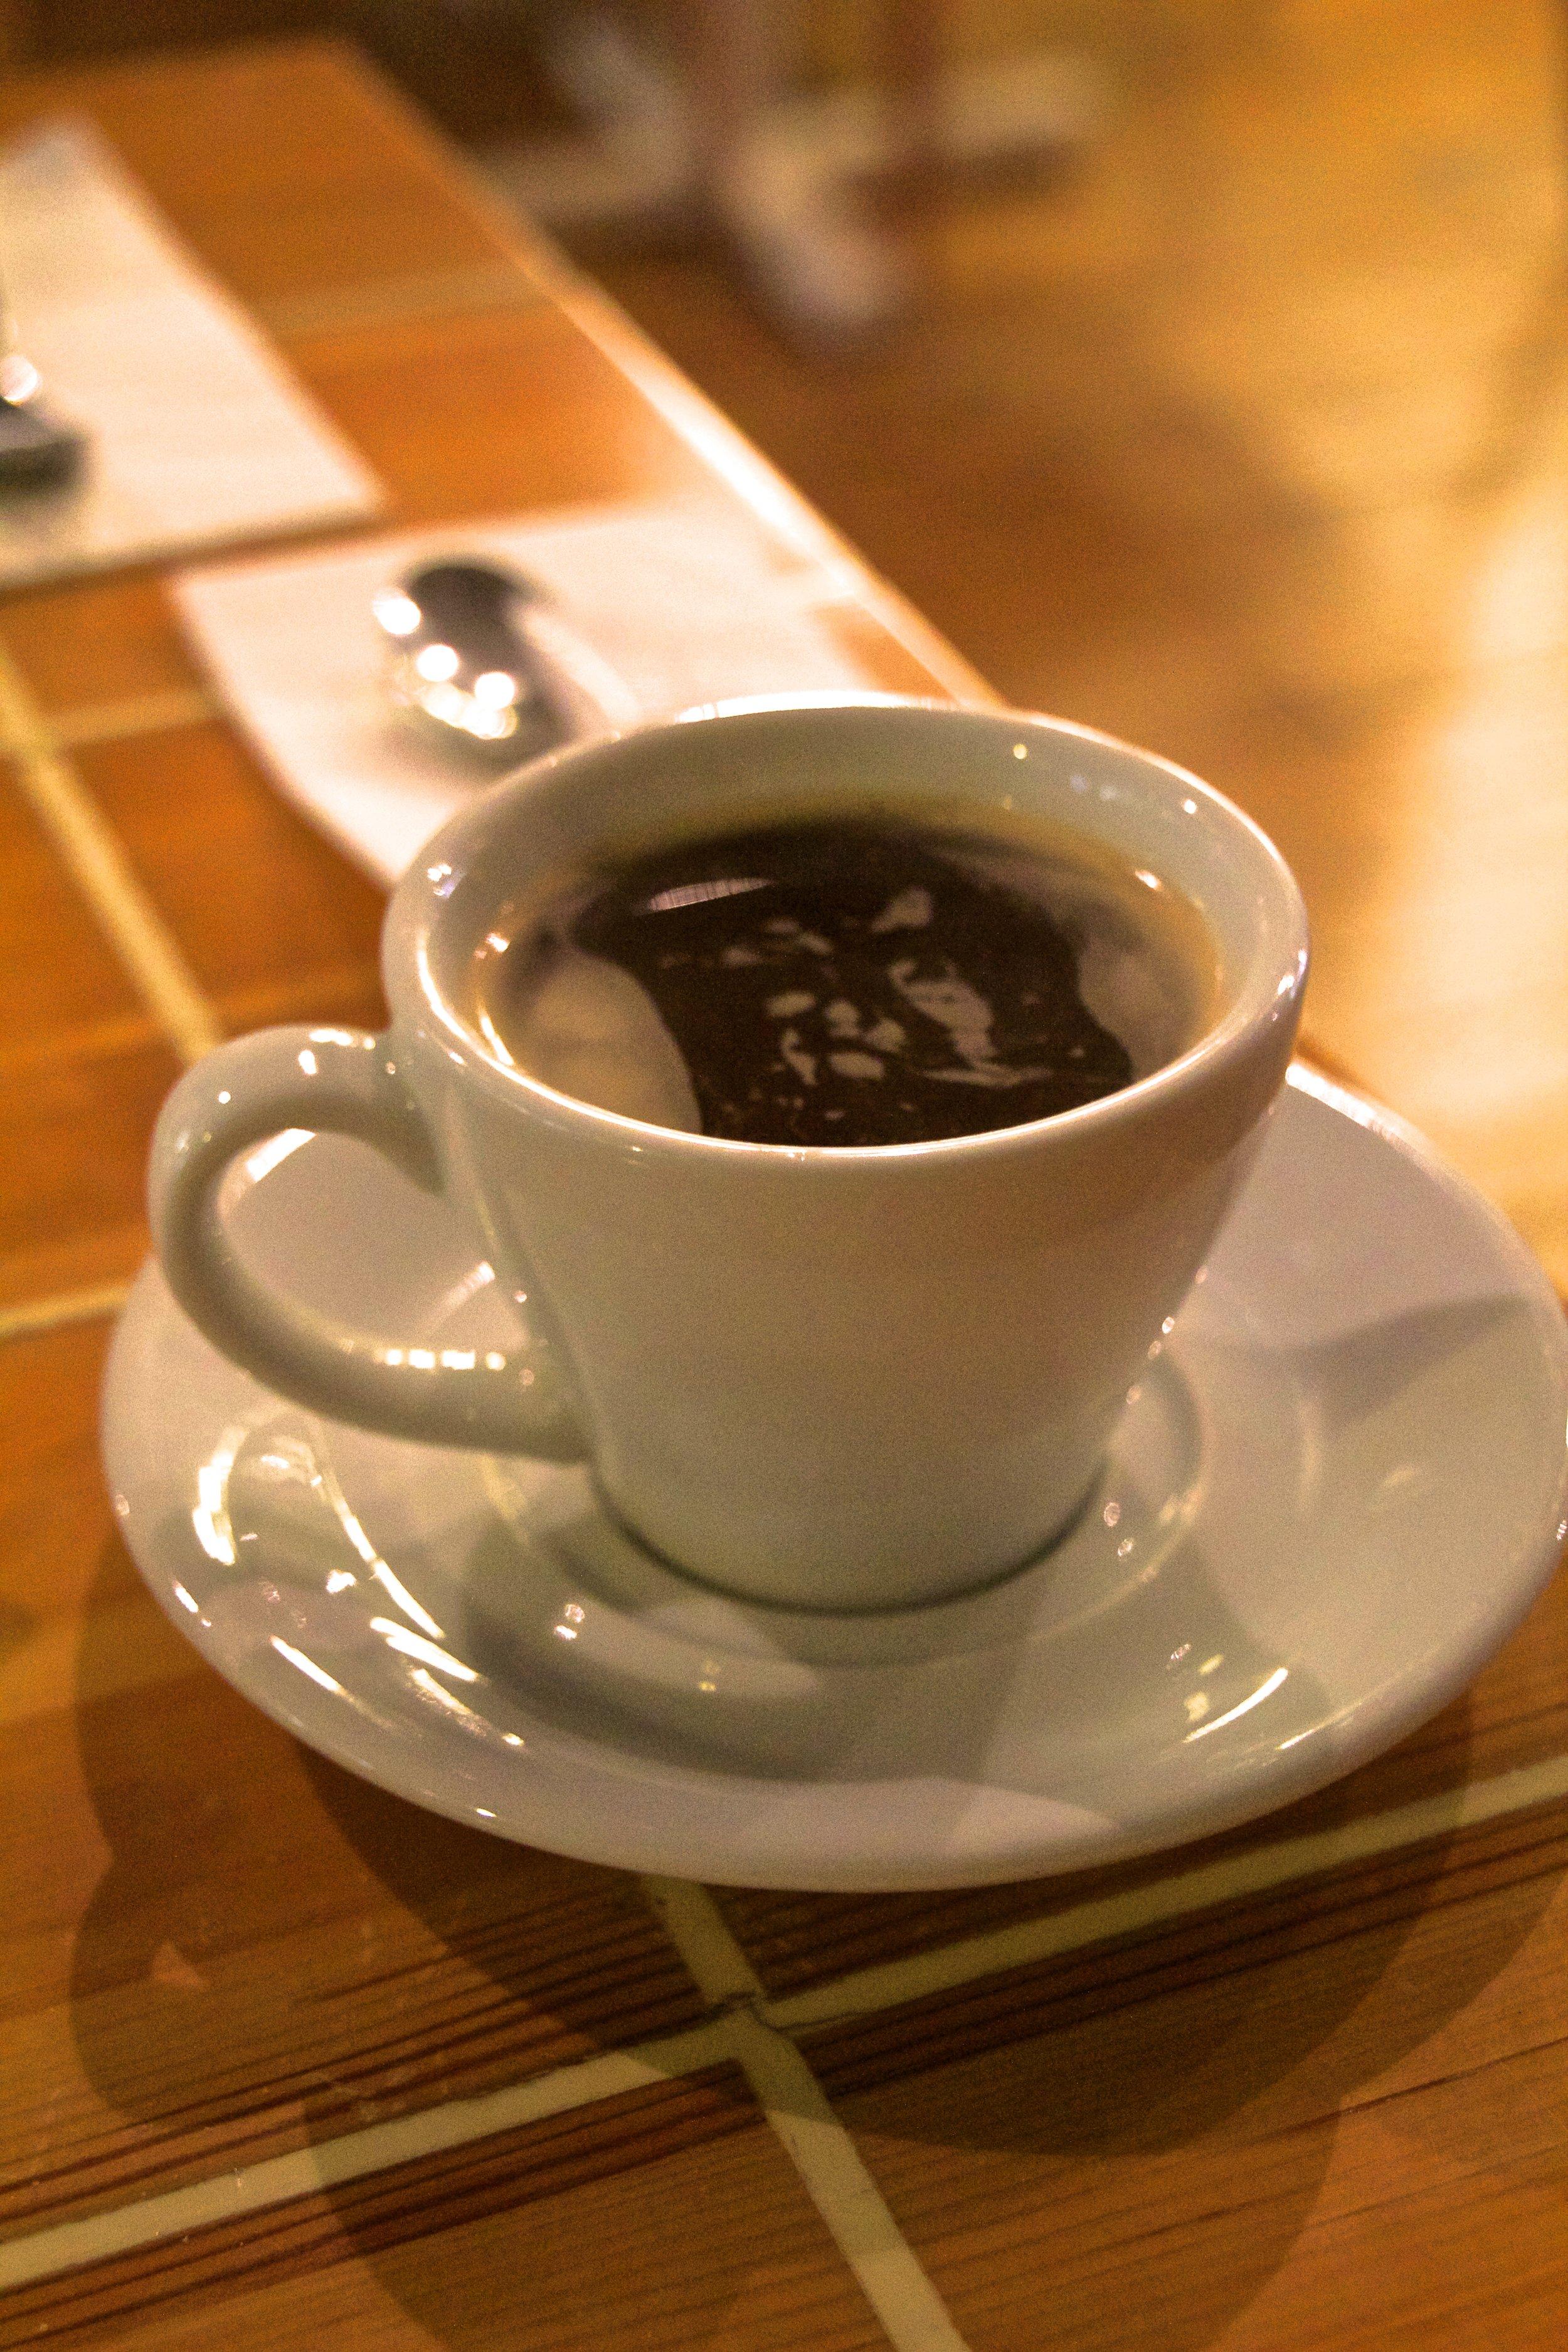 walter's coffee kadikoy istanbul 6.jpg